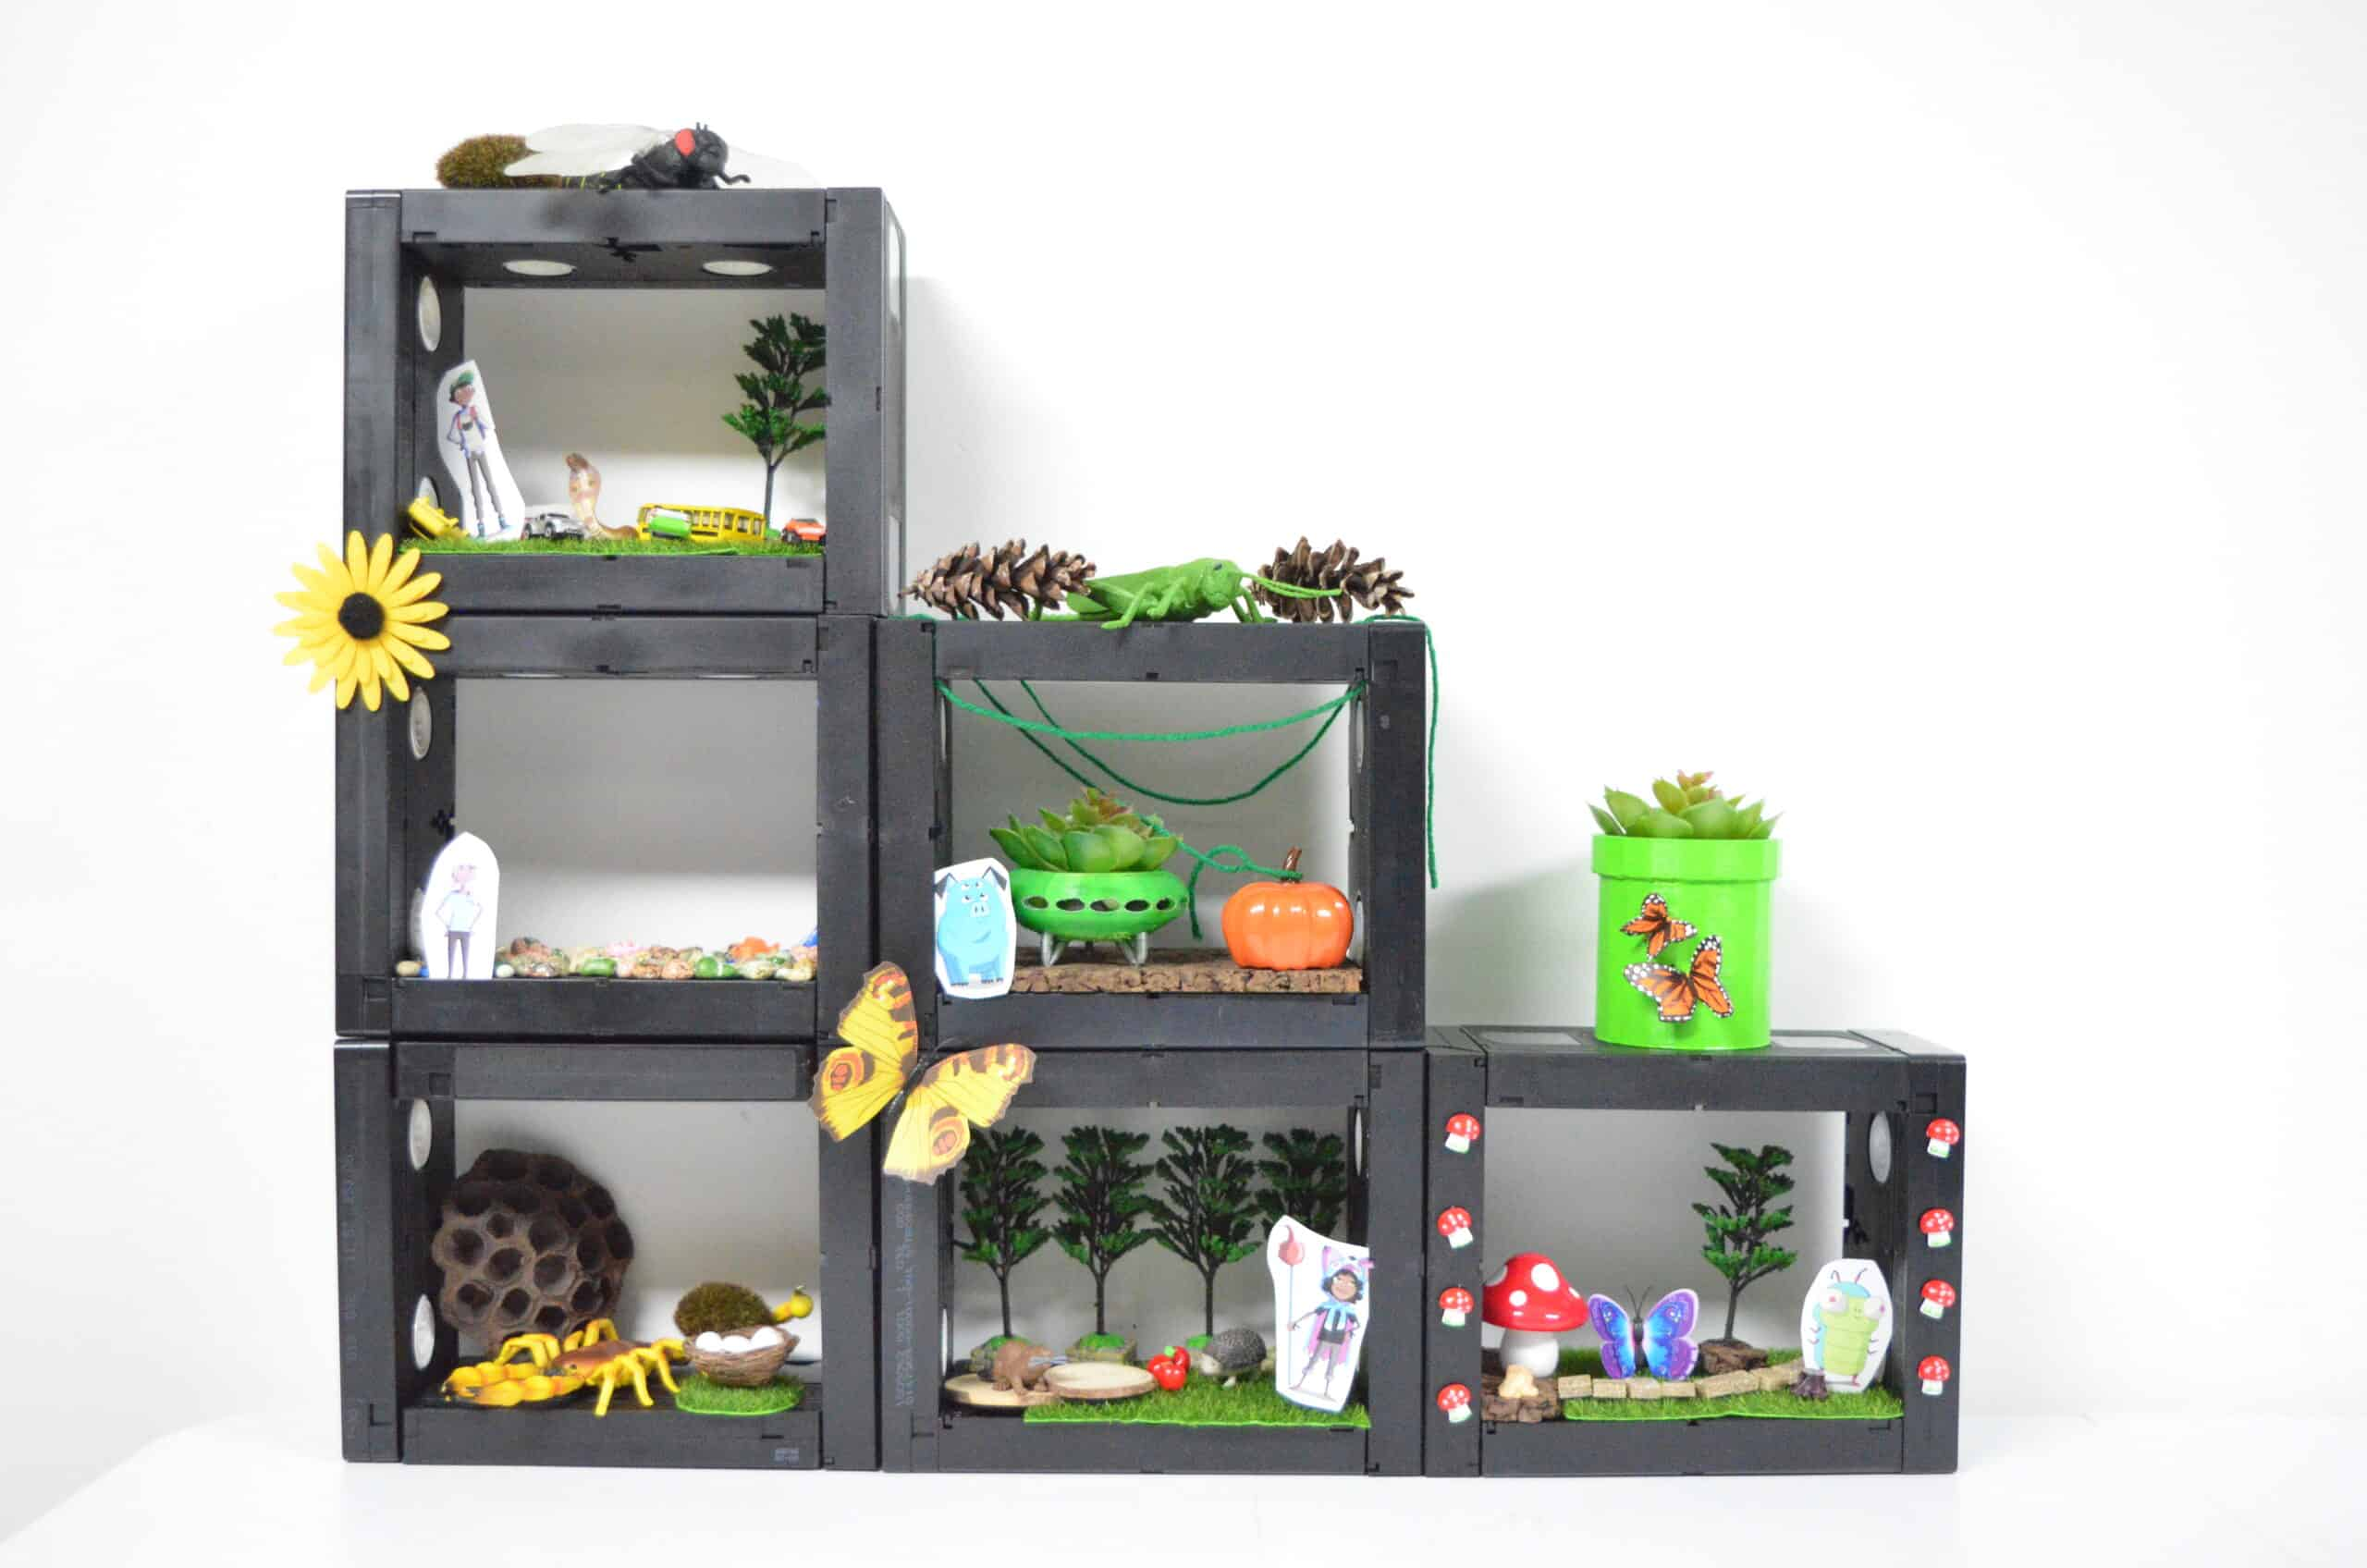 DIY VHS diorama play set shelf system